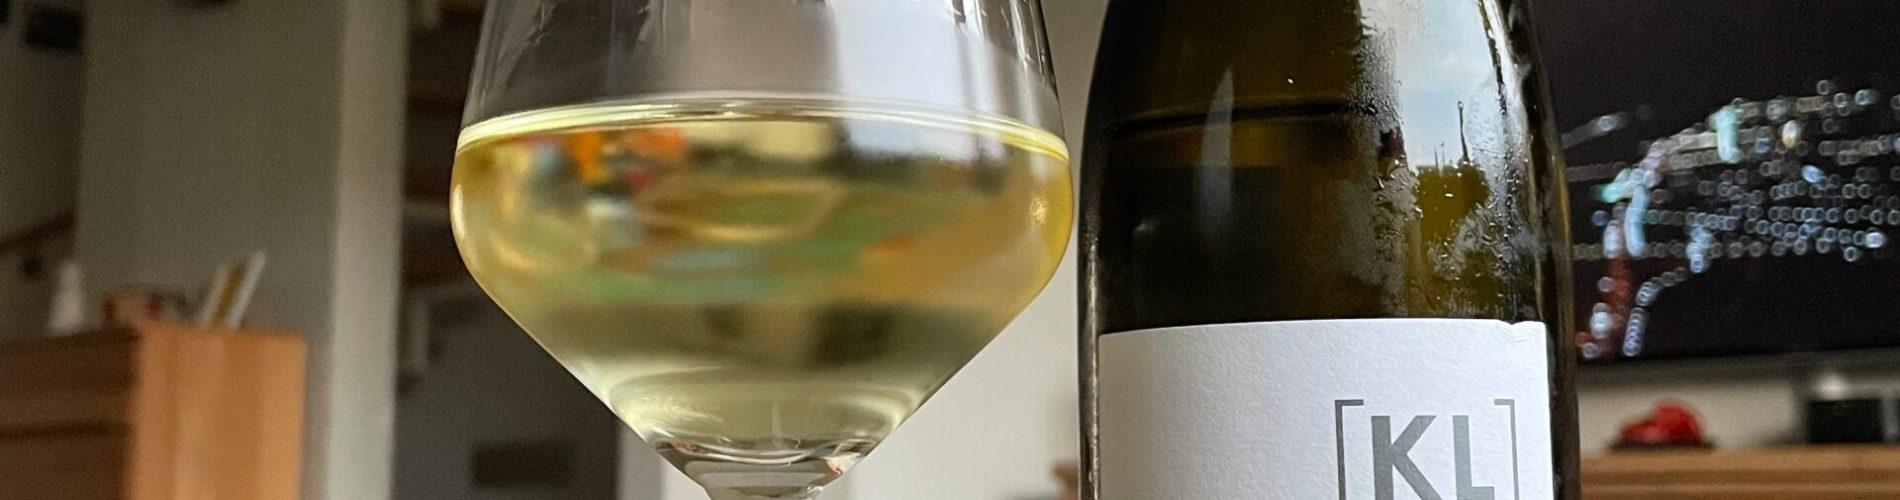 2019 Chardonnay trocken Bimbacher Schlossgarten Prichsenstadt, Kerstin Laufer